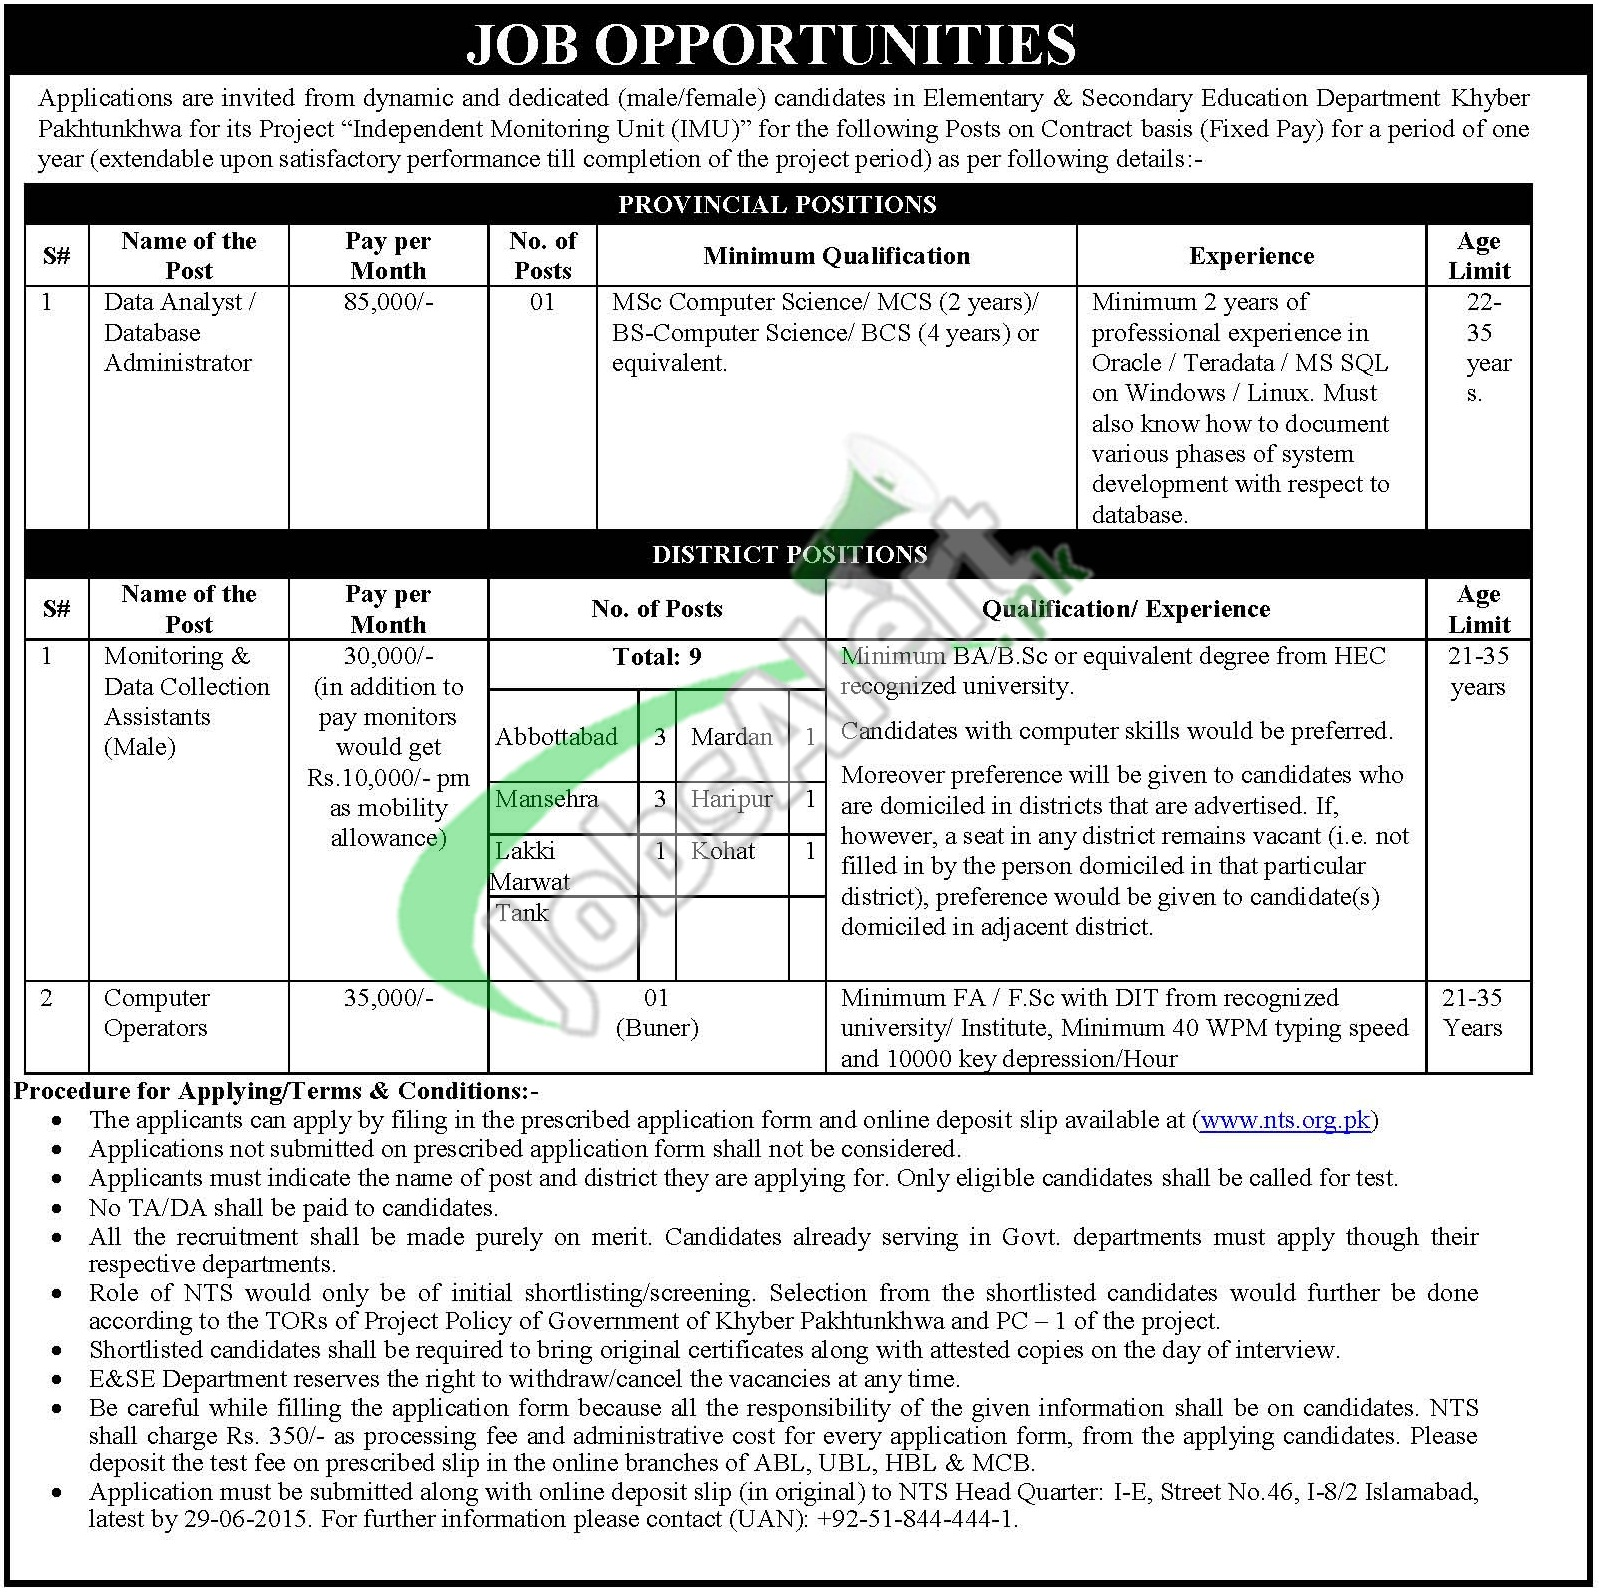 KPK Elementary & Secondary Education Jobs